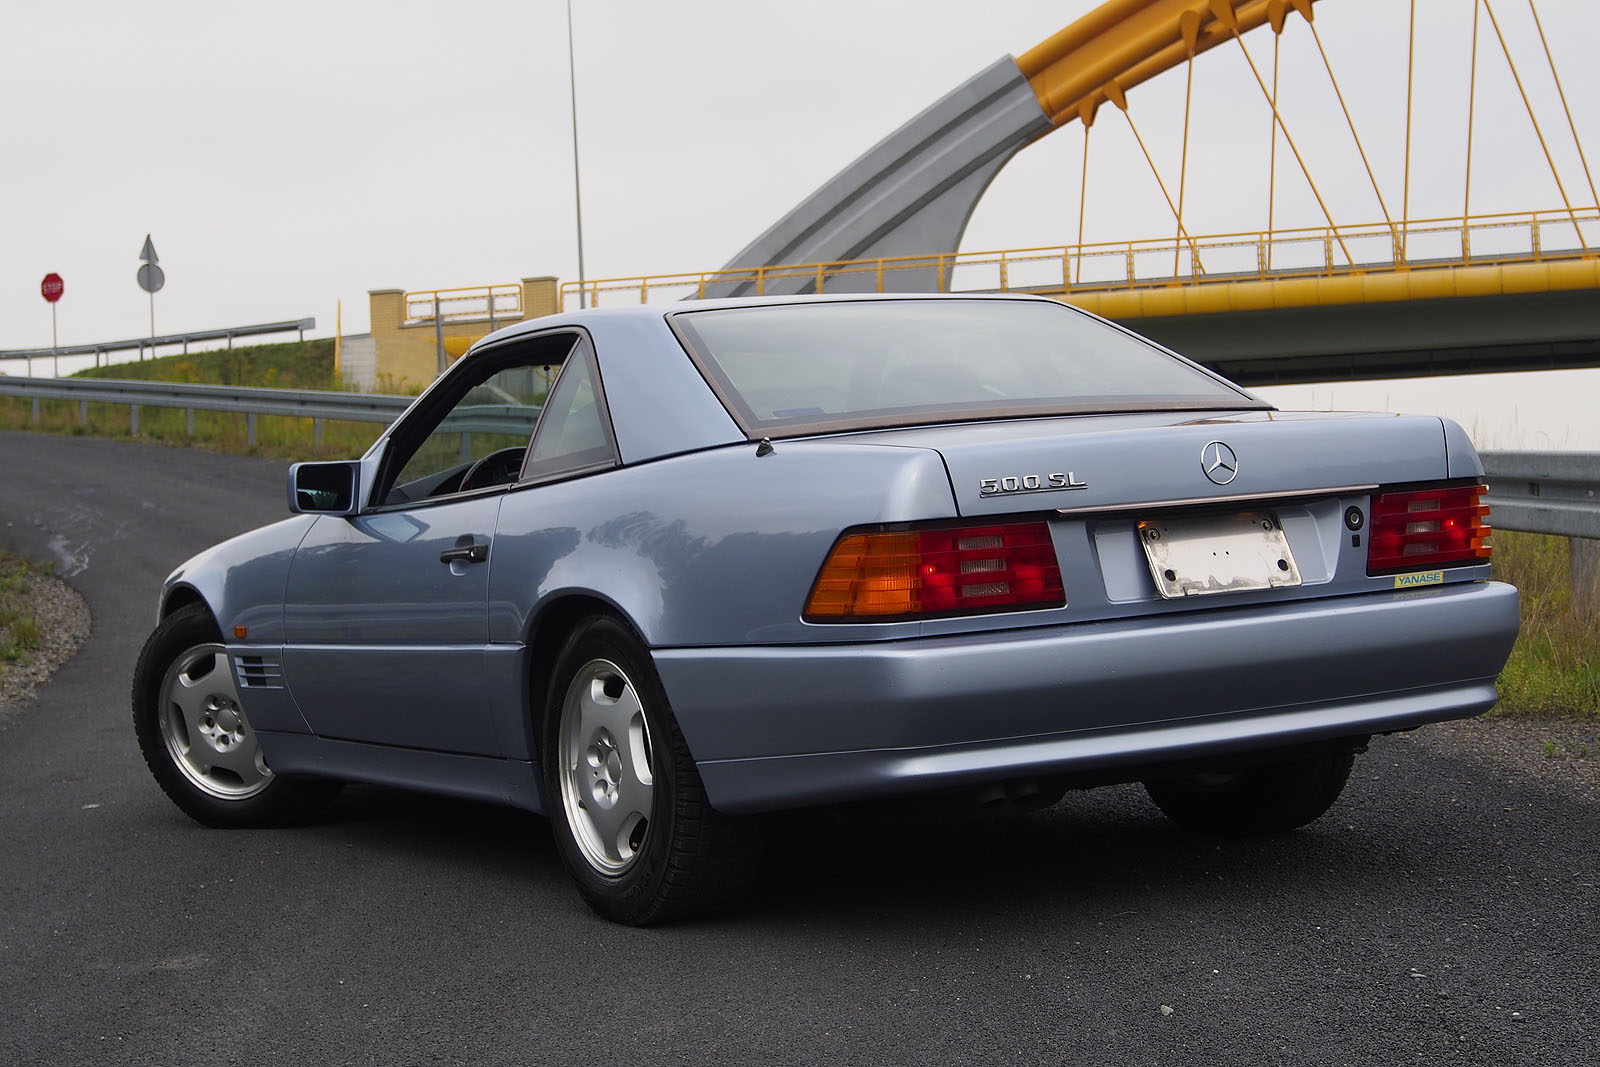 91 mercedes benz 500 sl nowex cars for Mercedes benz 500